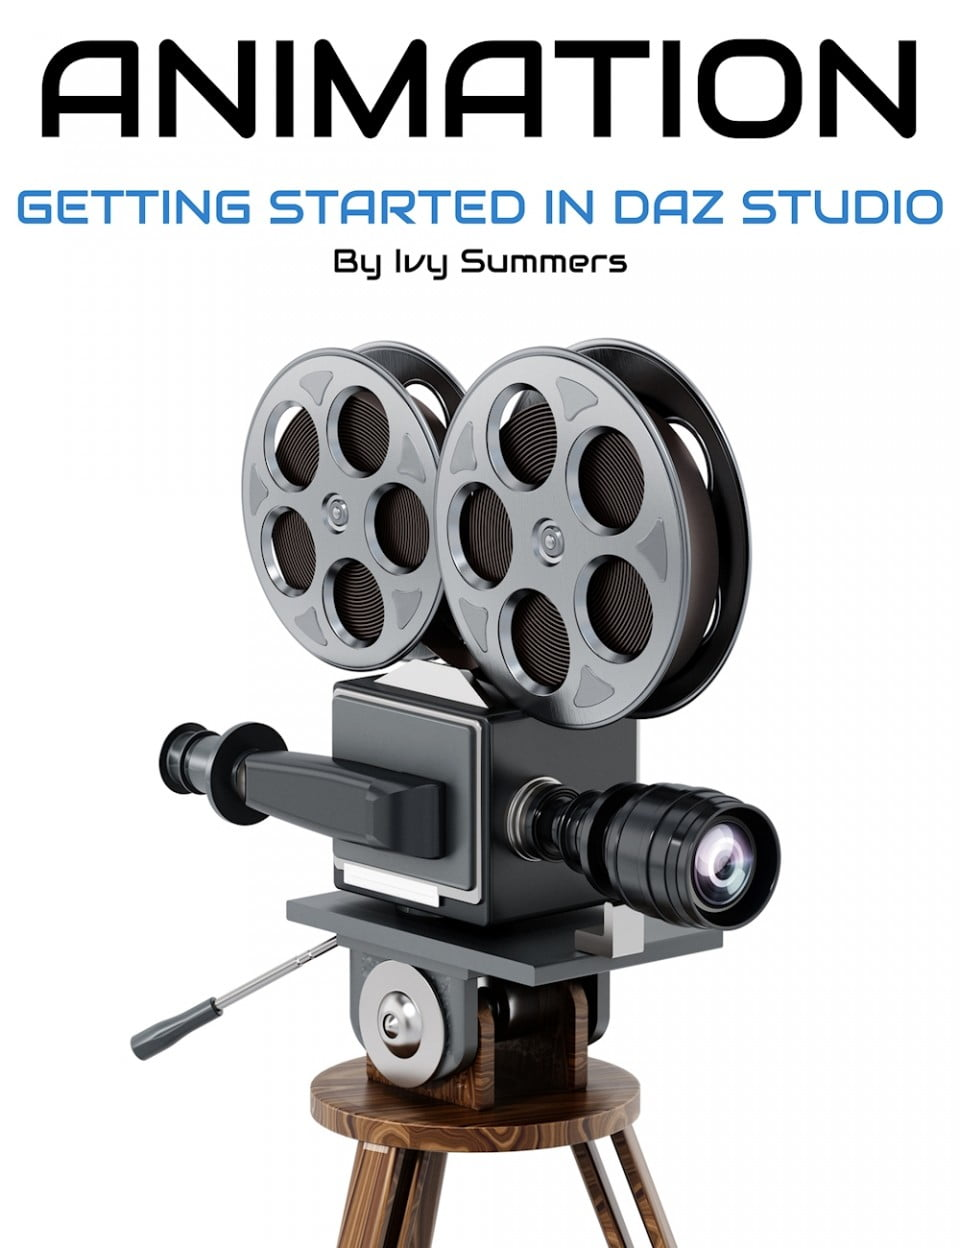 Daz Studio : Getting Started with Animation